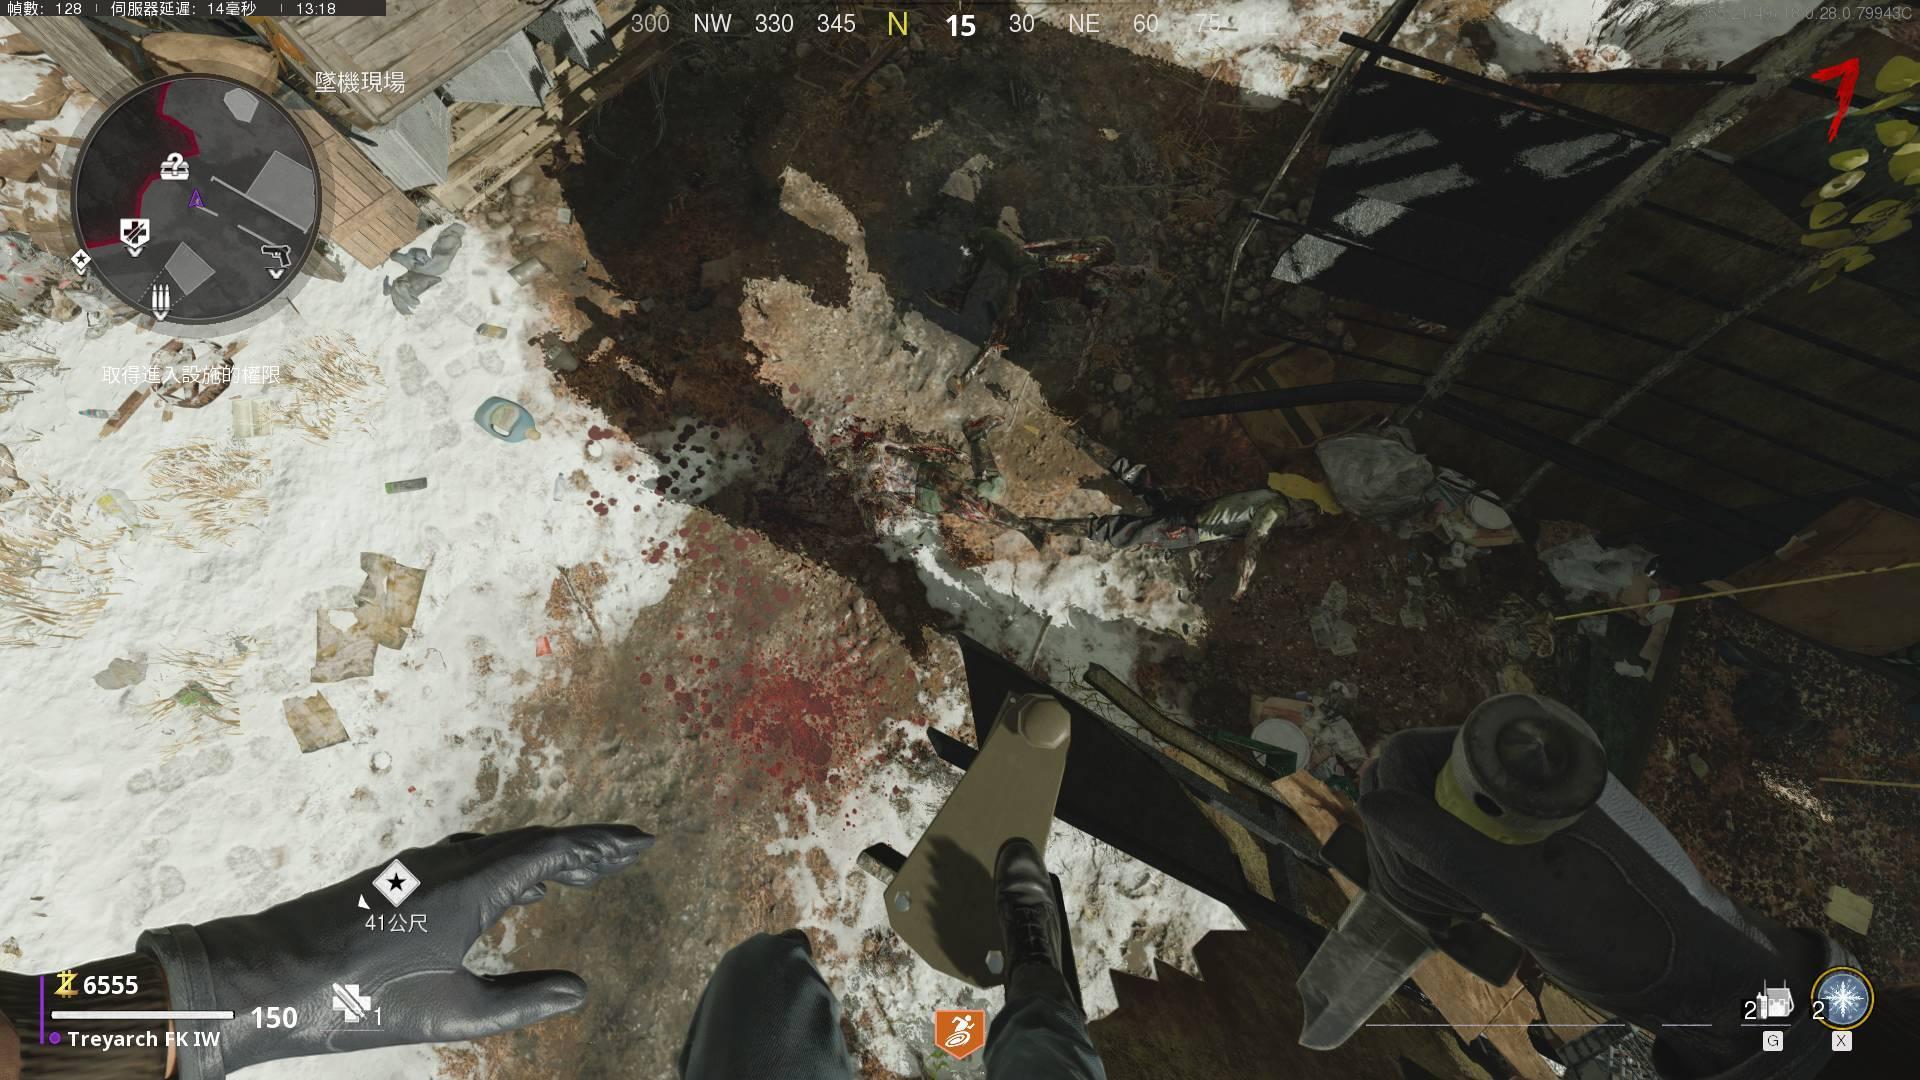 COD17僵尸-单人新手向快速解锁帕克小姐姐攻略